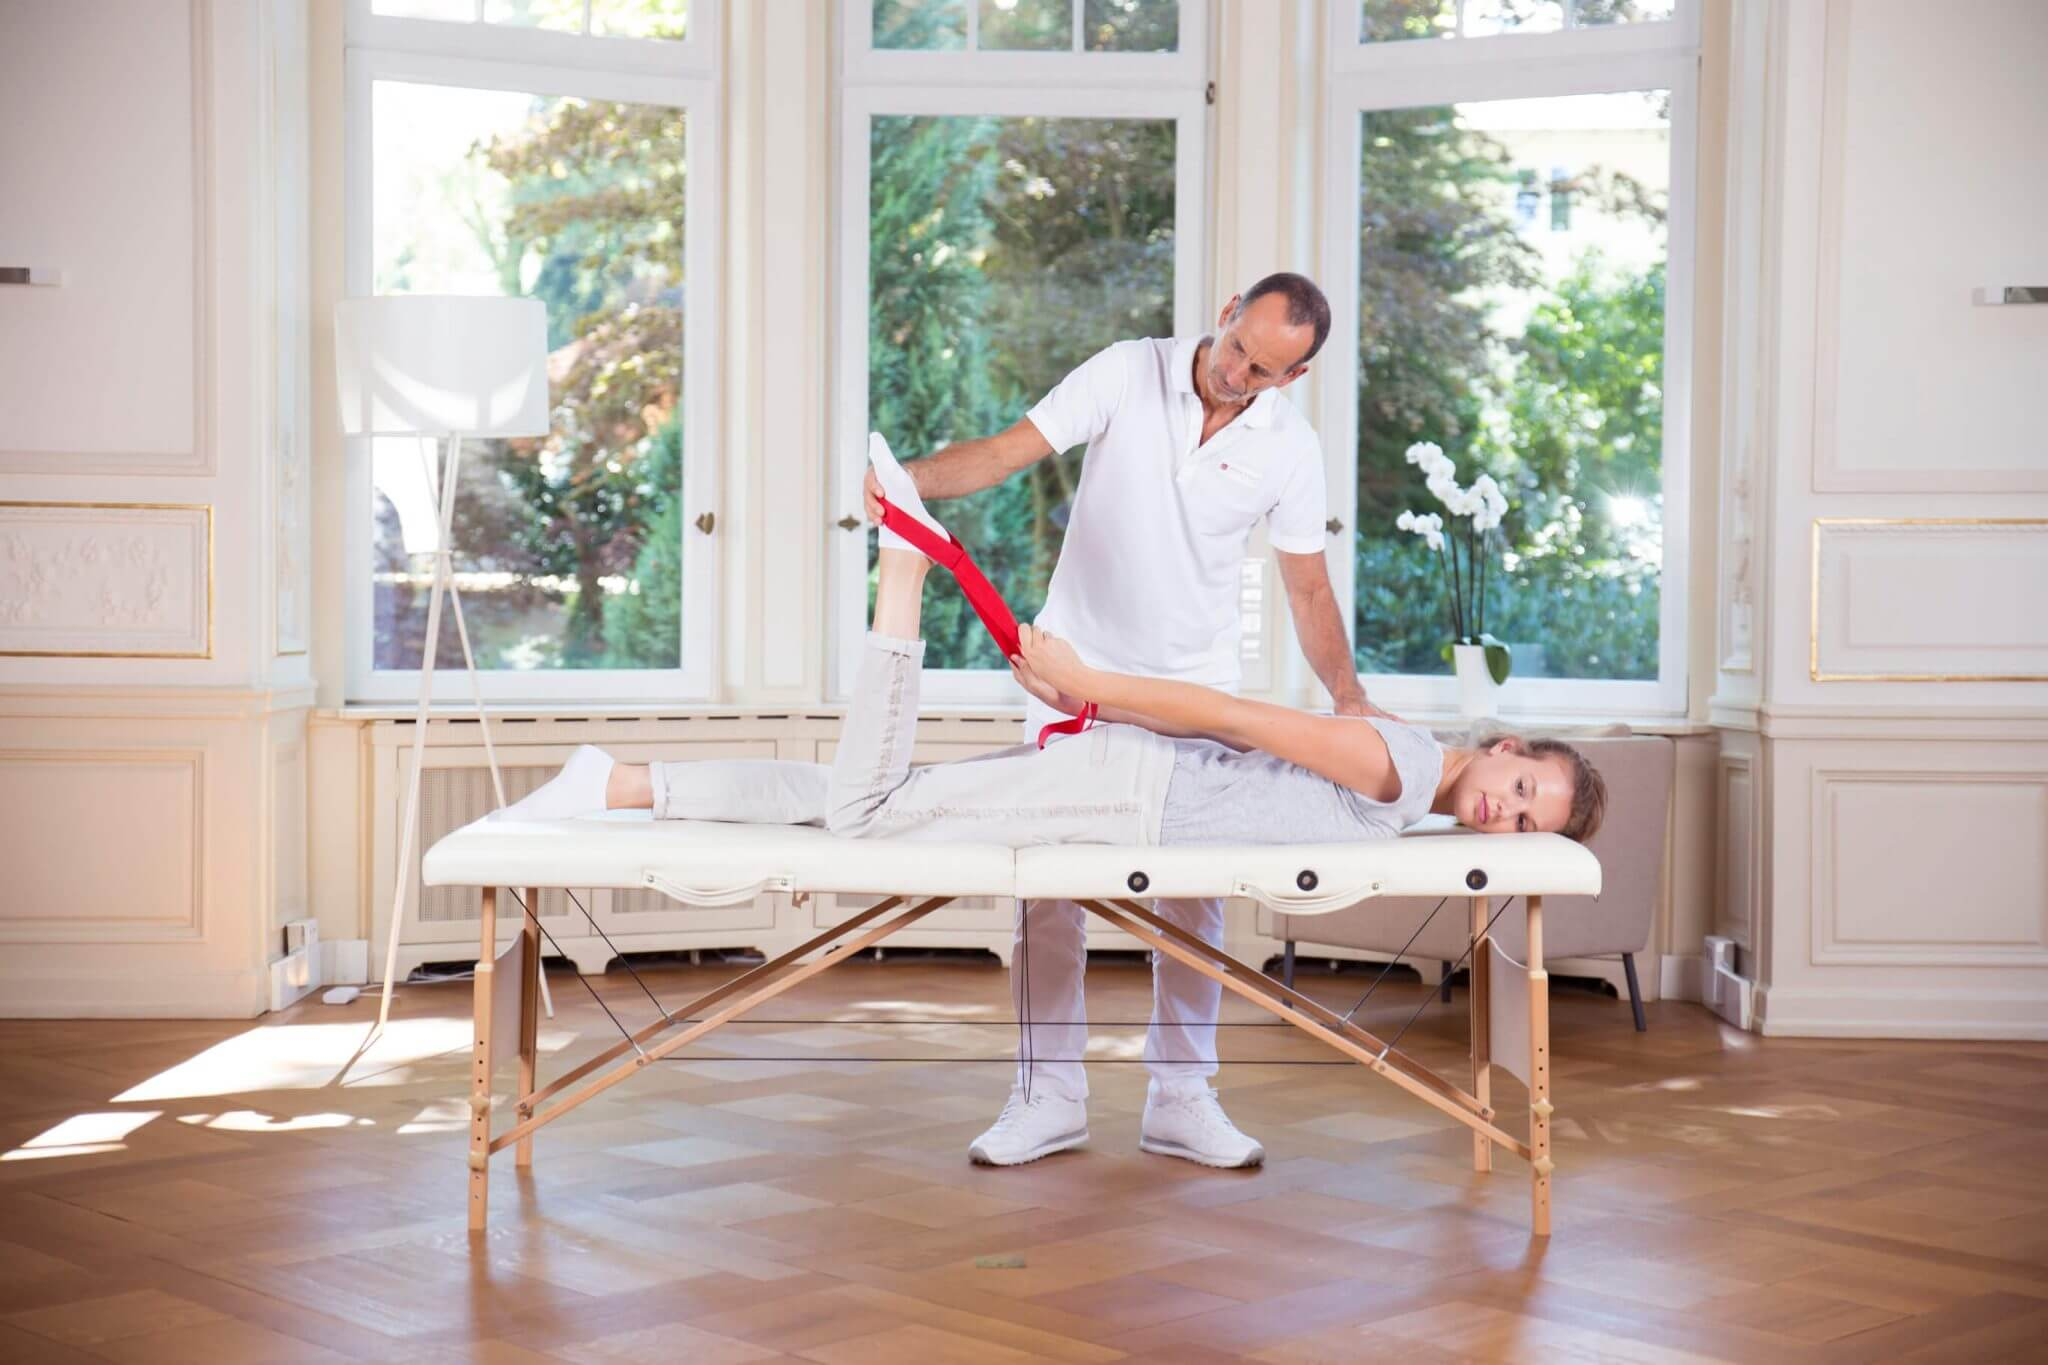 Schmerzen durch Kniearthrose